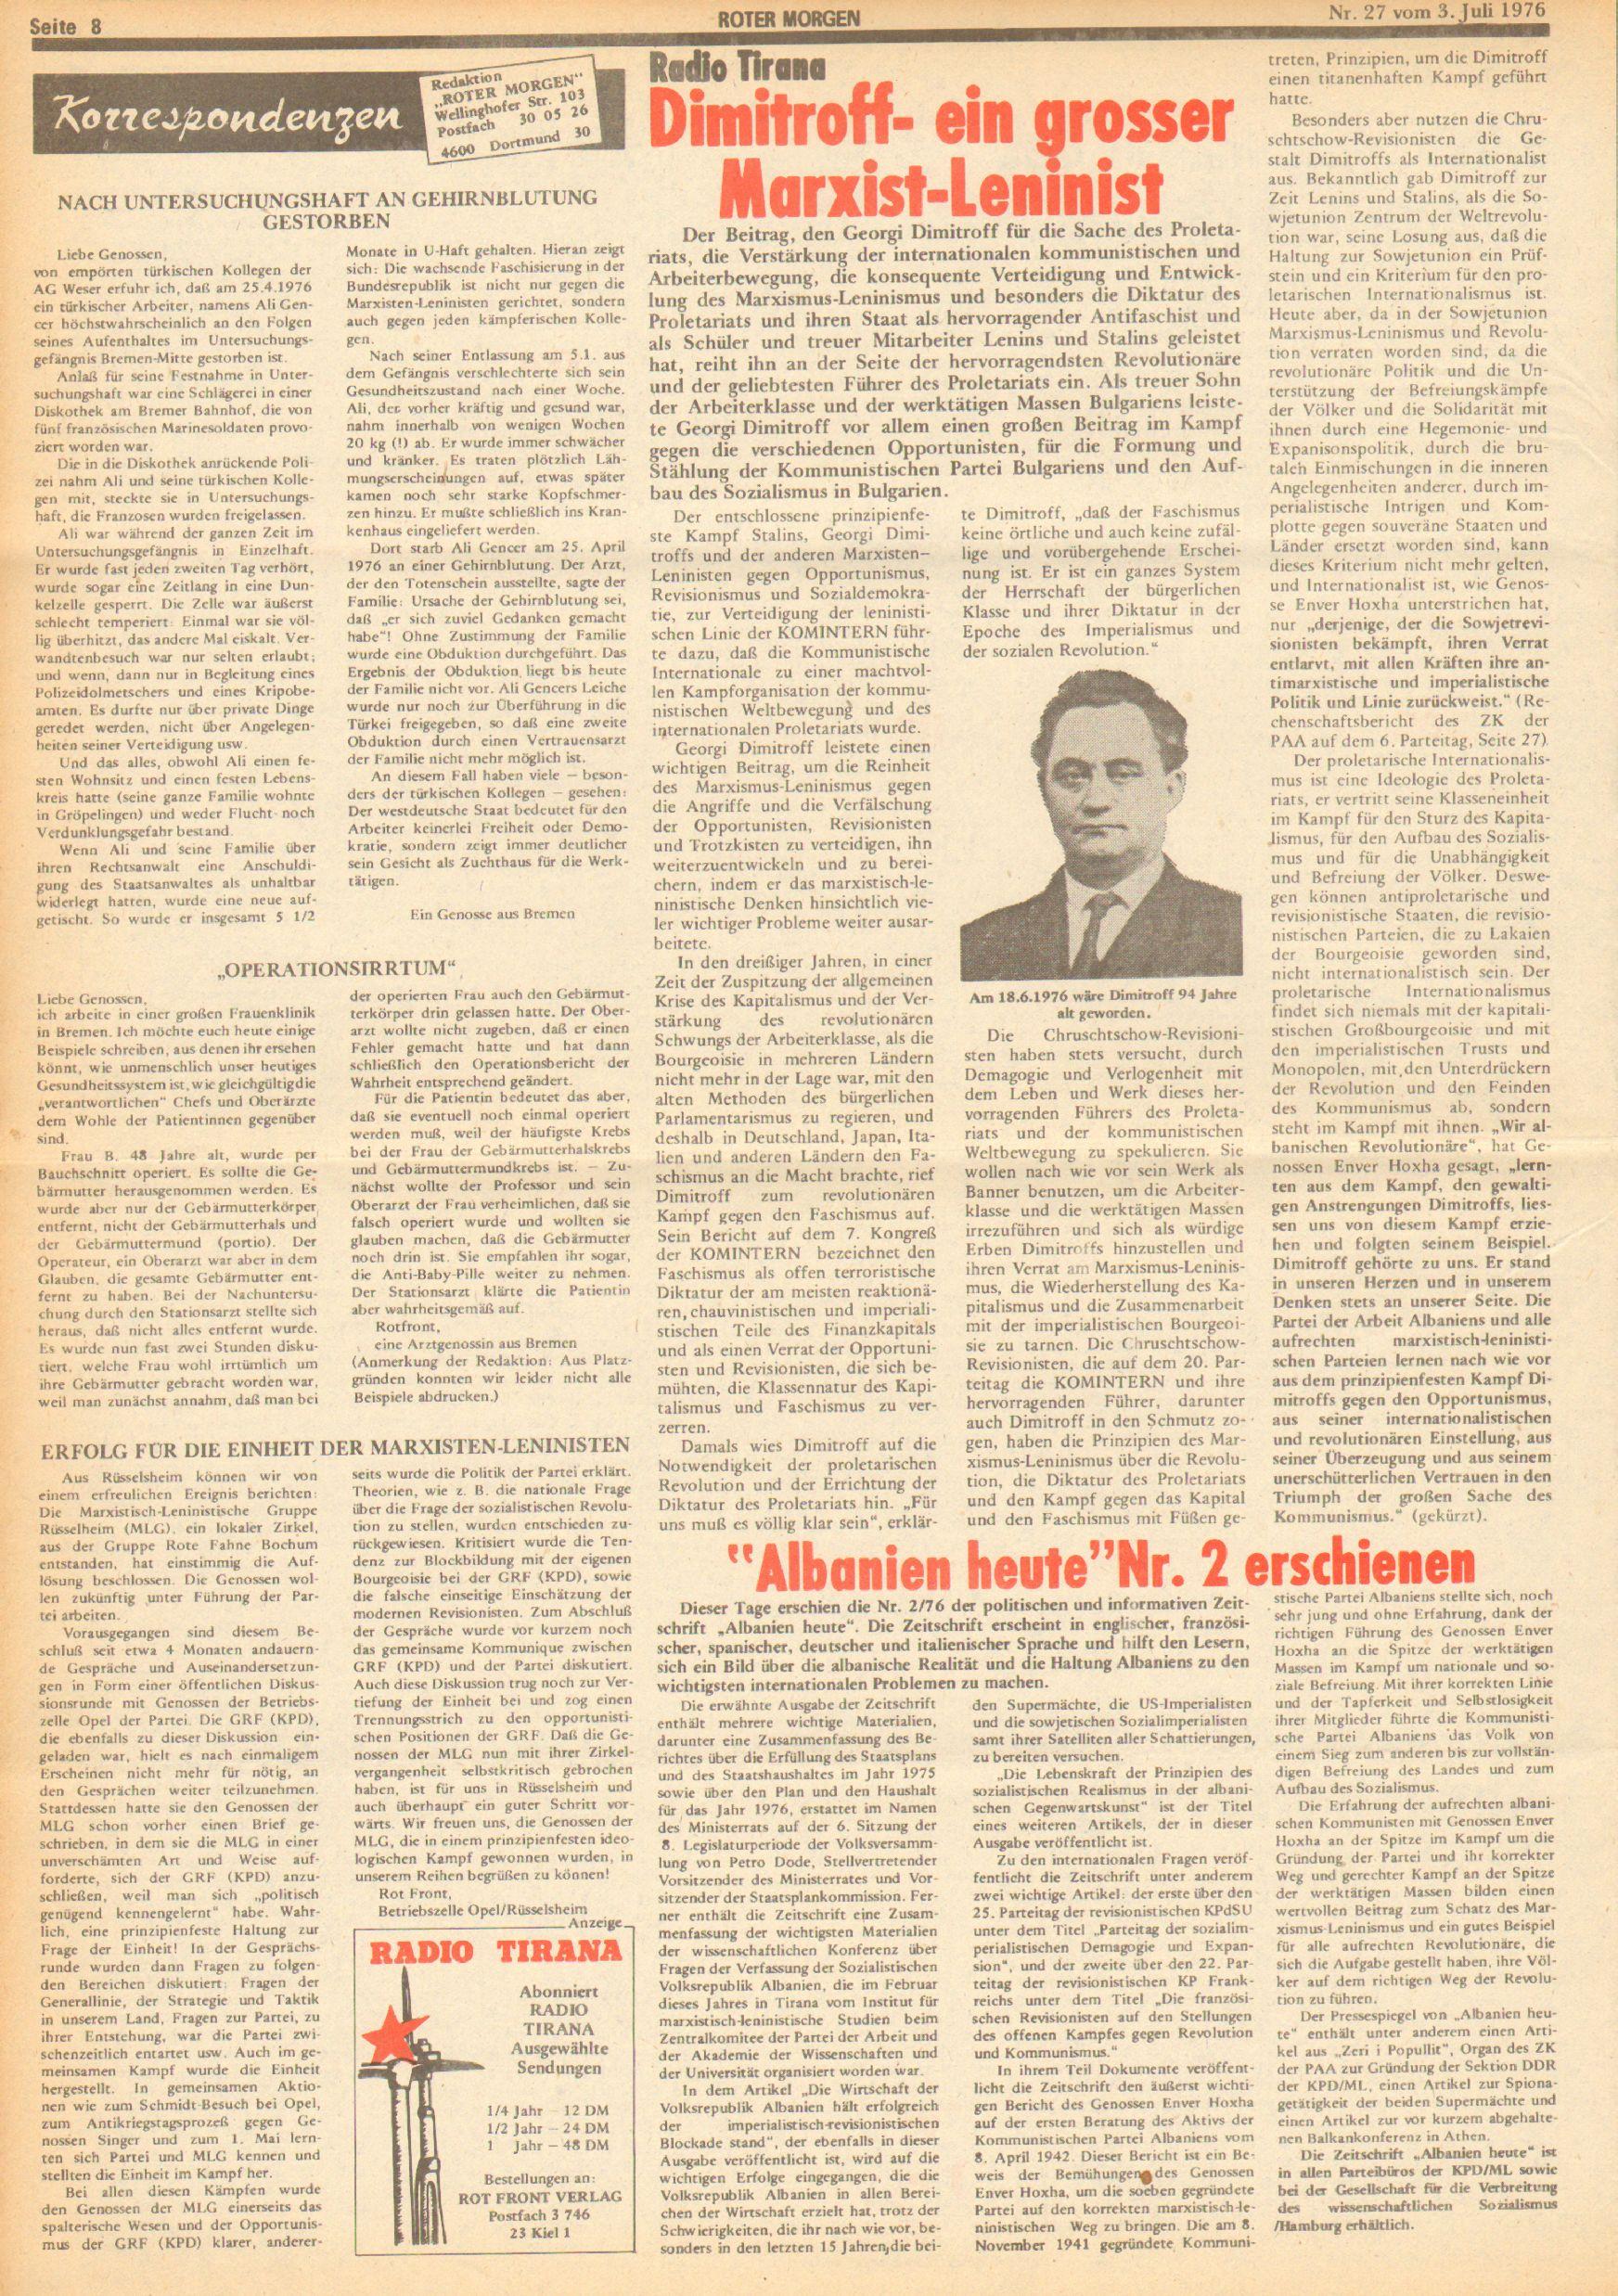 Roter Morgen, 10. Jg., 3. Juli 1976, Nr. 27, Seite 8